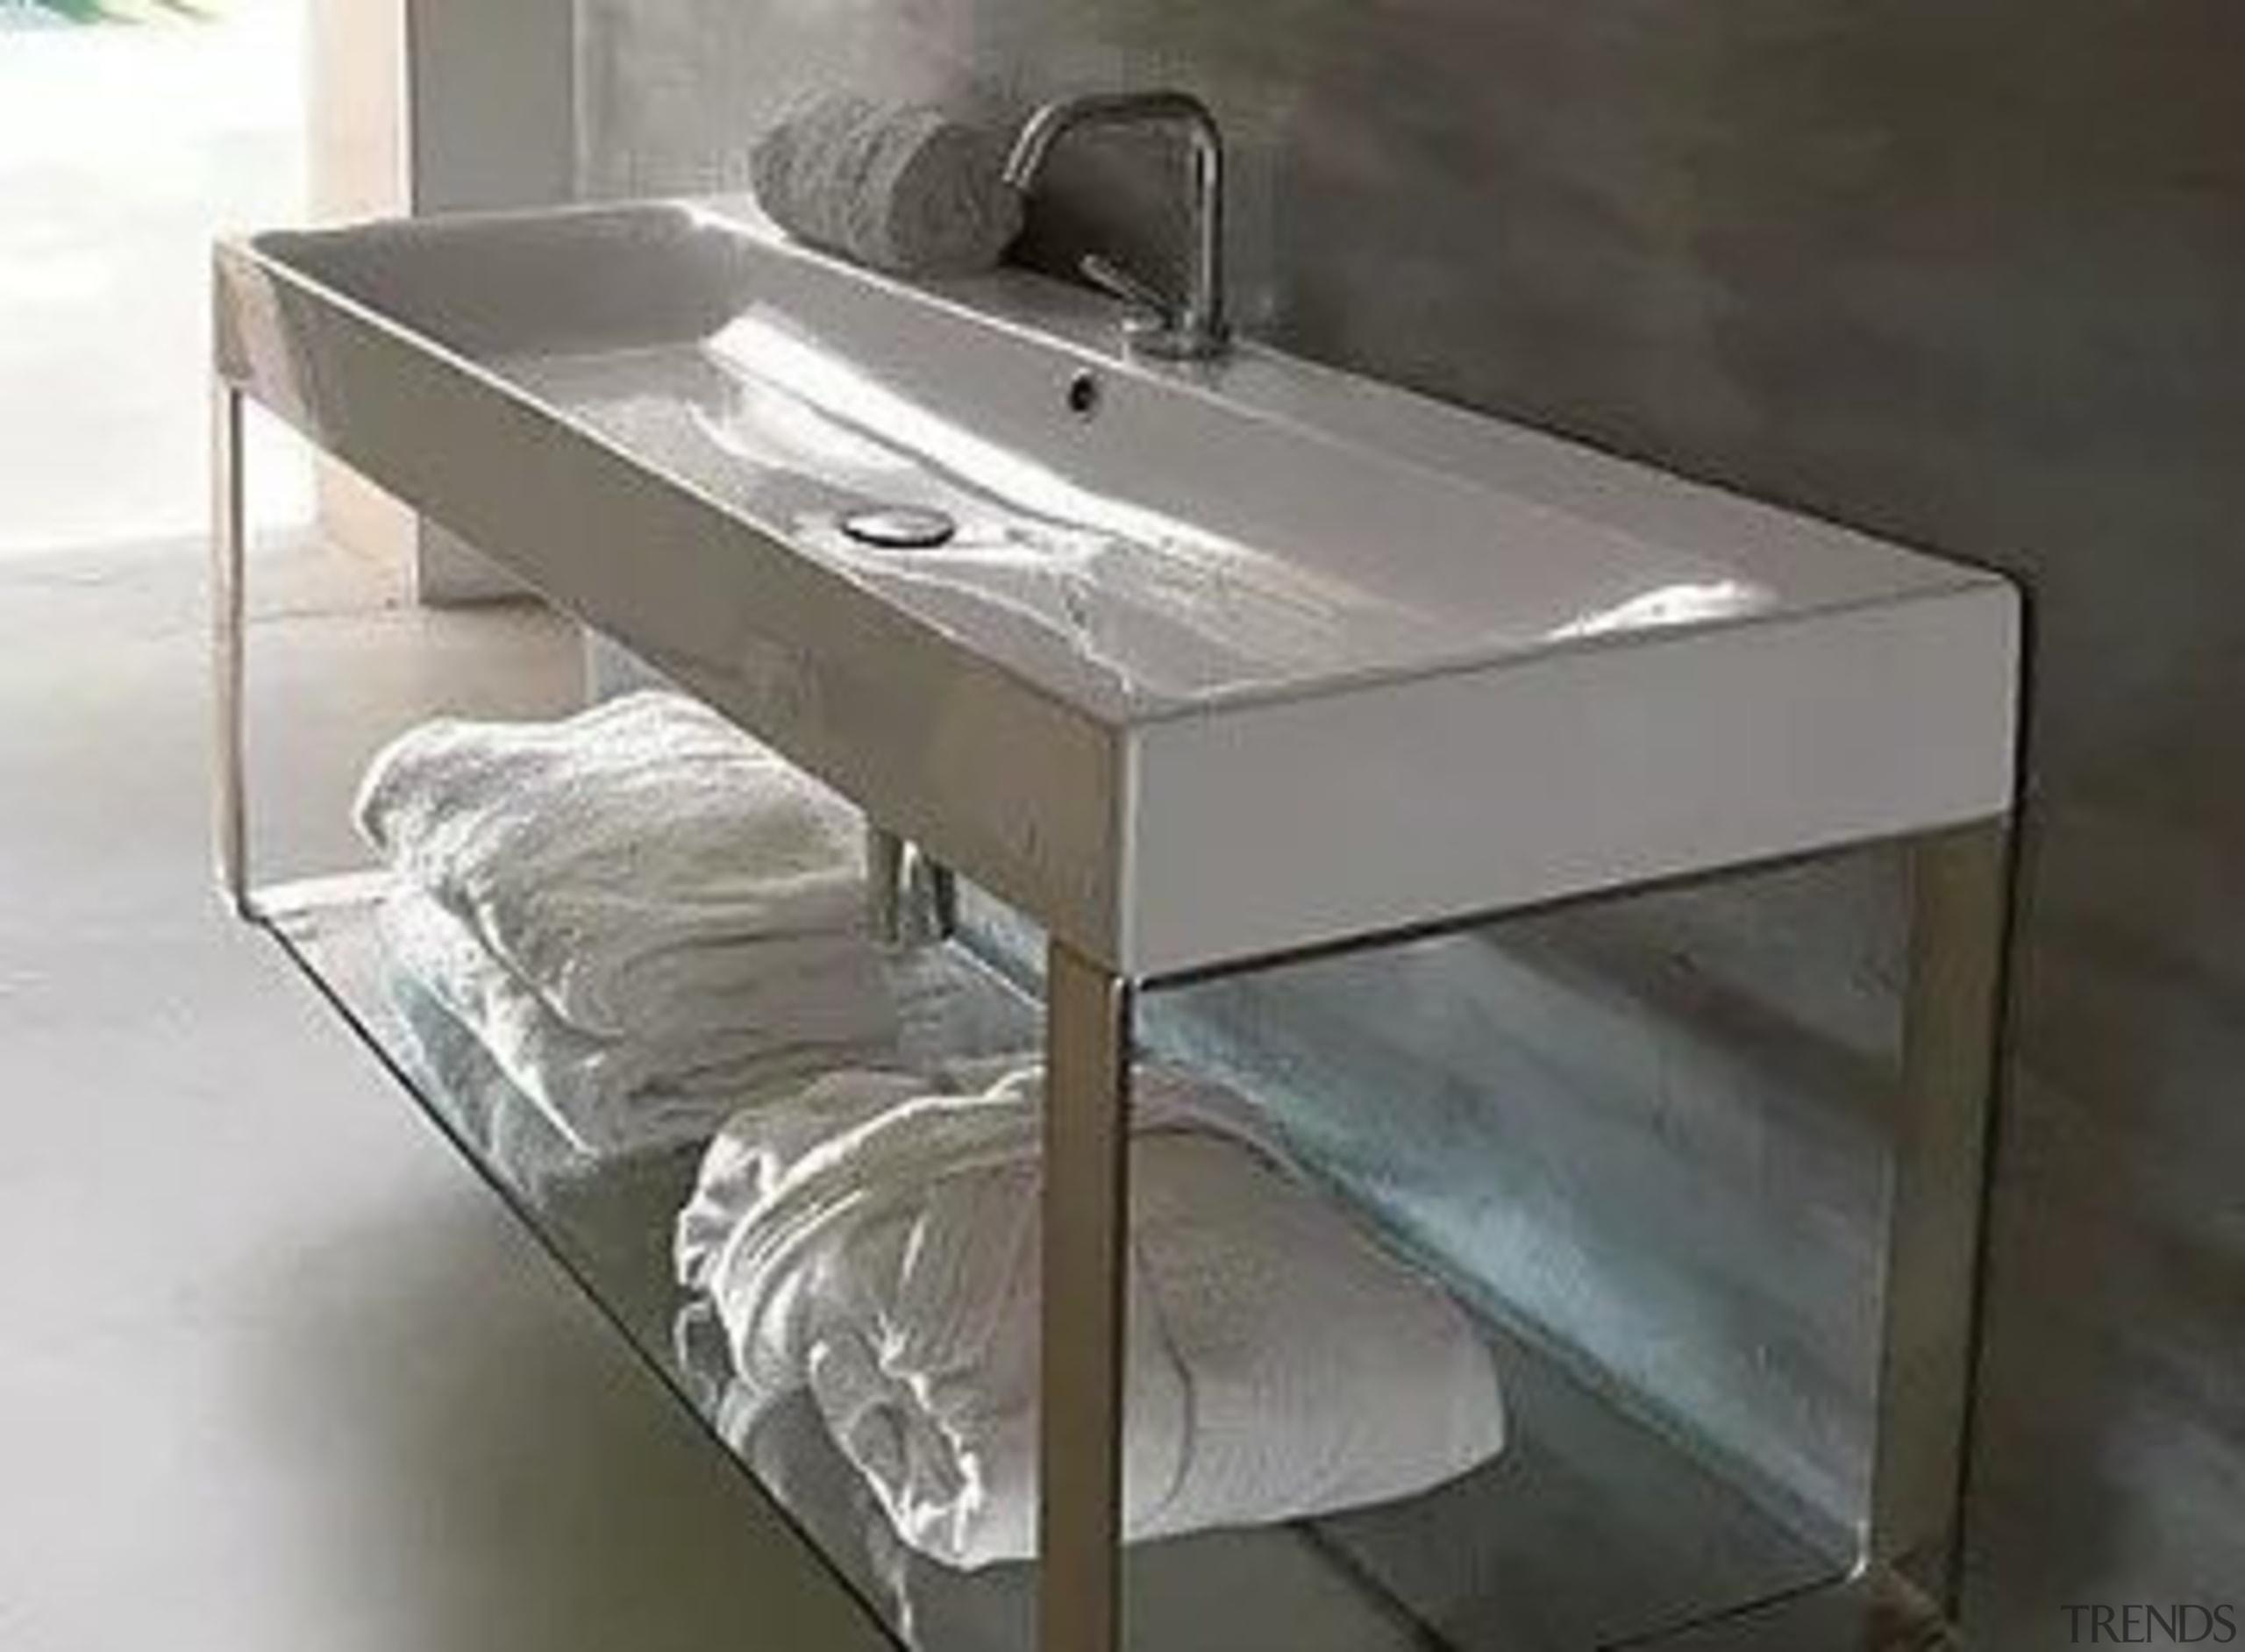 Cento - bathroom sink | furniture | plumbing bathroom sink, furniture, plumbing fixture, product, product design, sink, tap, gray, black